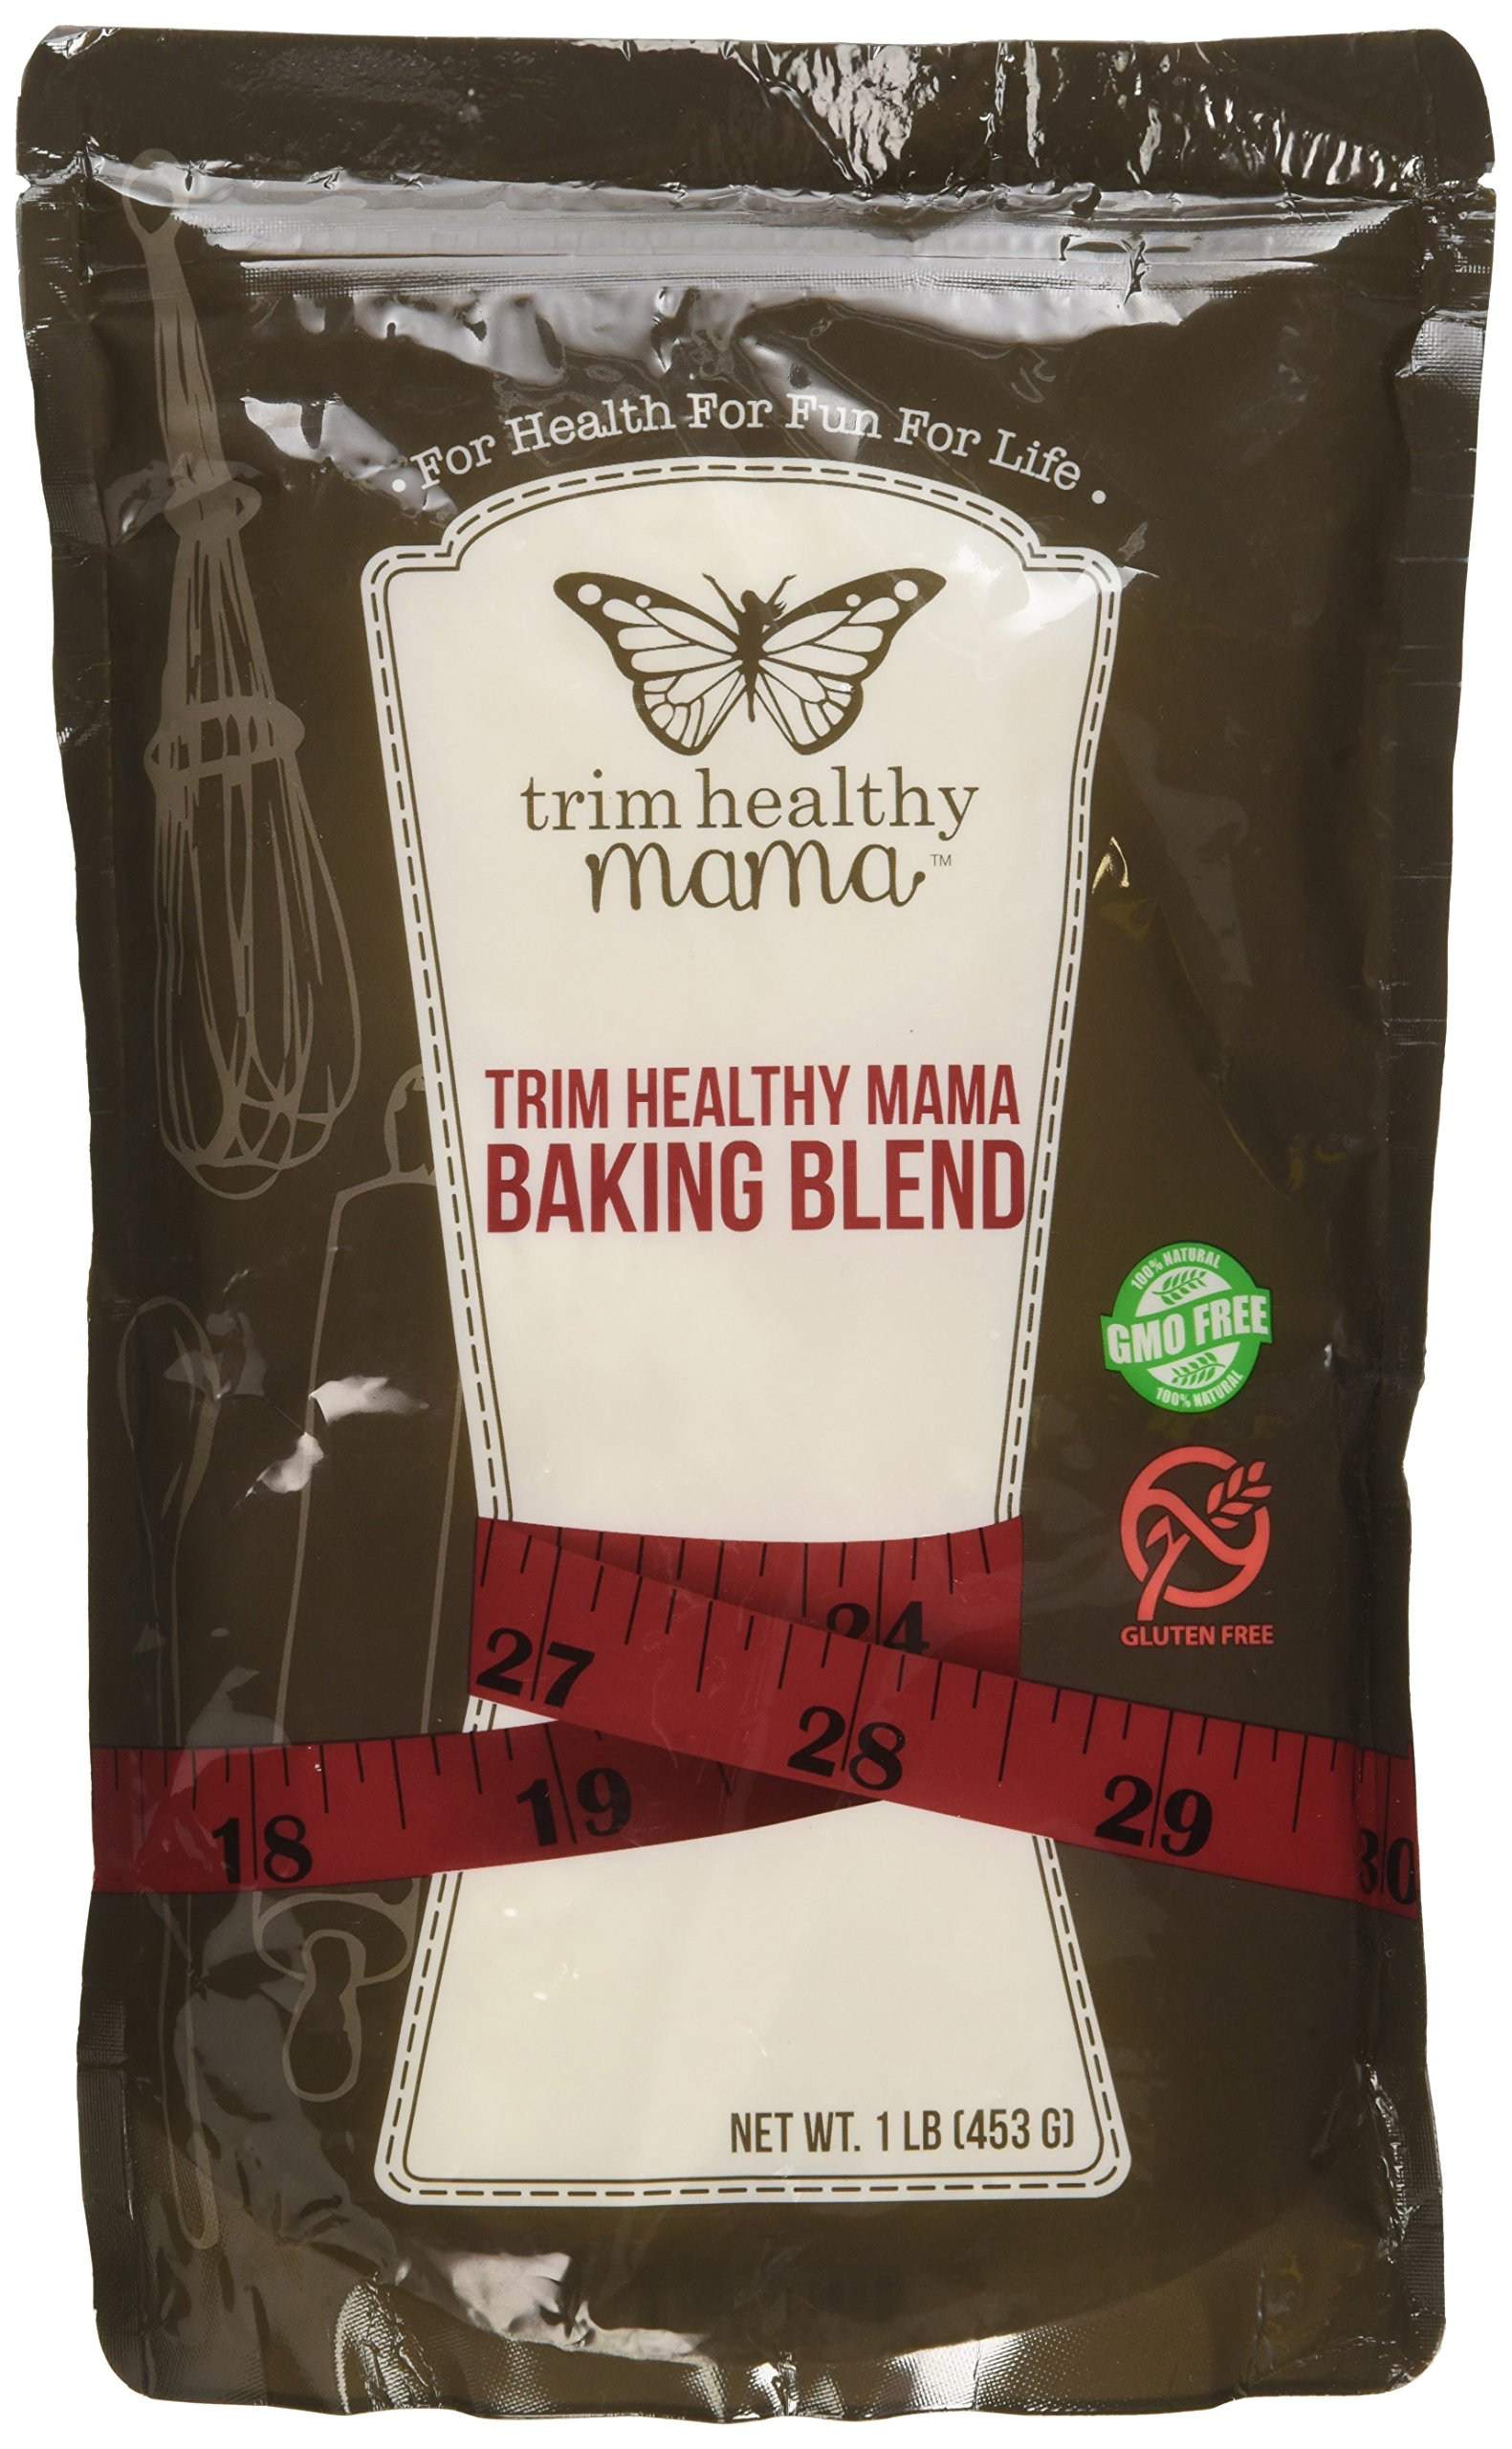 Trim Healthy Mama Gluten Free, Low Glycemic, High Fiber Baking Blend 1 Lb